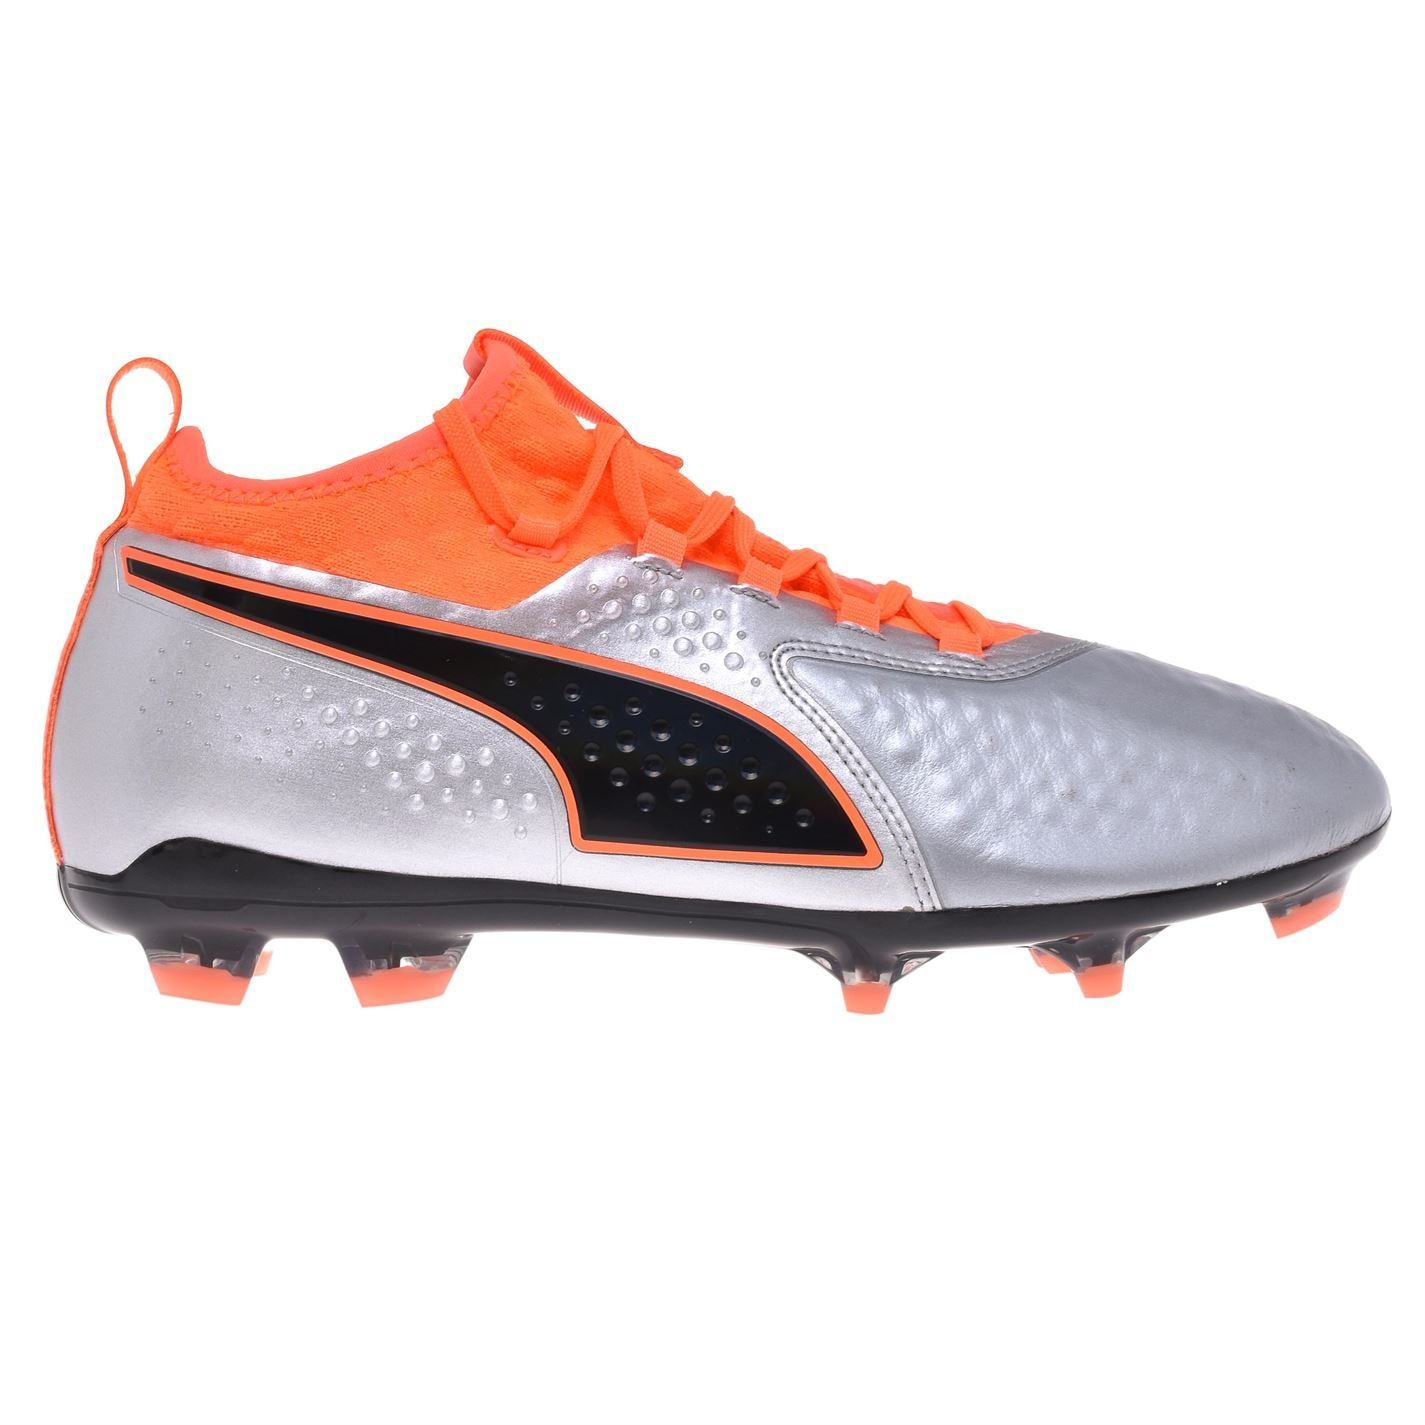 miniature 11 - Puma-One-2-Cuir-engins-fixes-Terre-Ferme-Chaussures-De-Football-Homme-Chaussures-de-foot-crampons